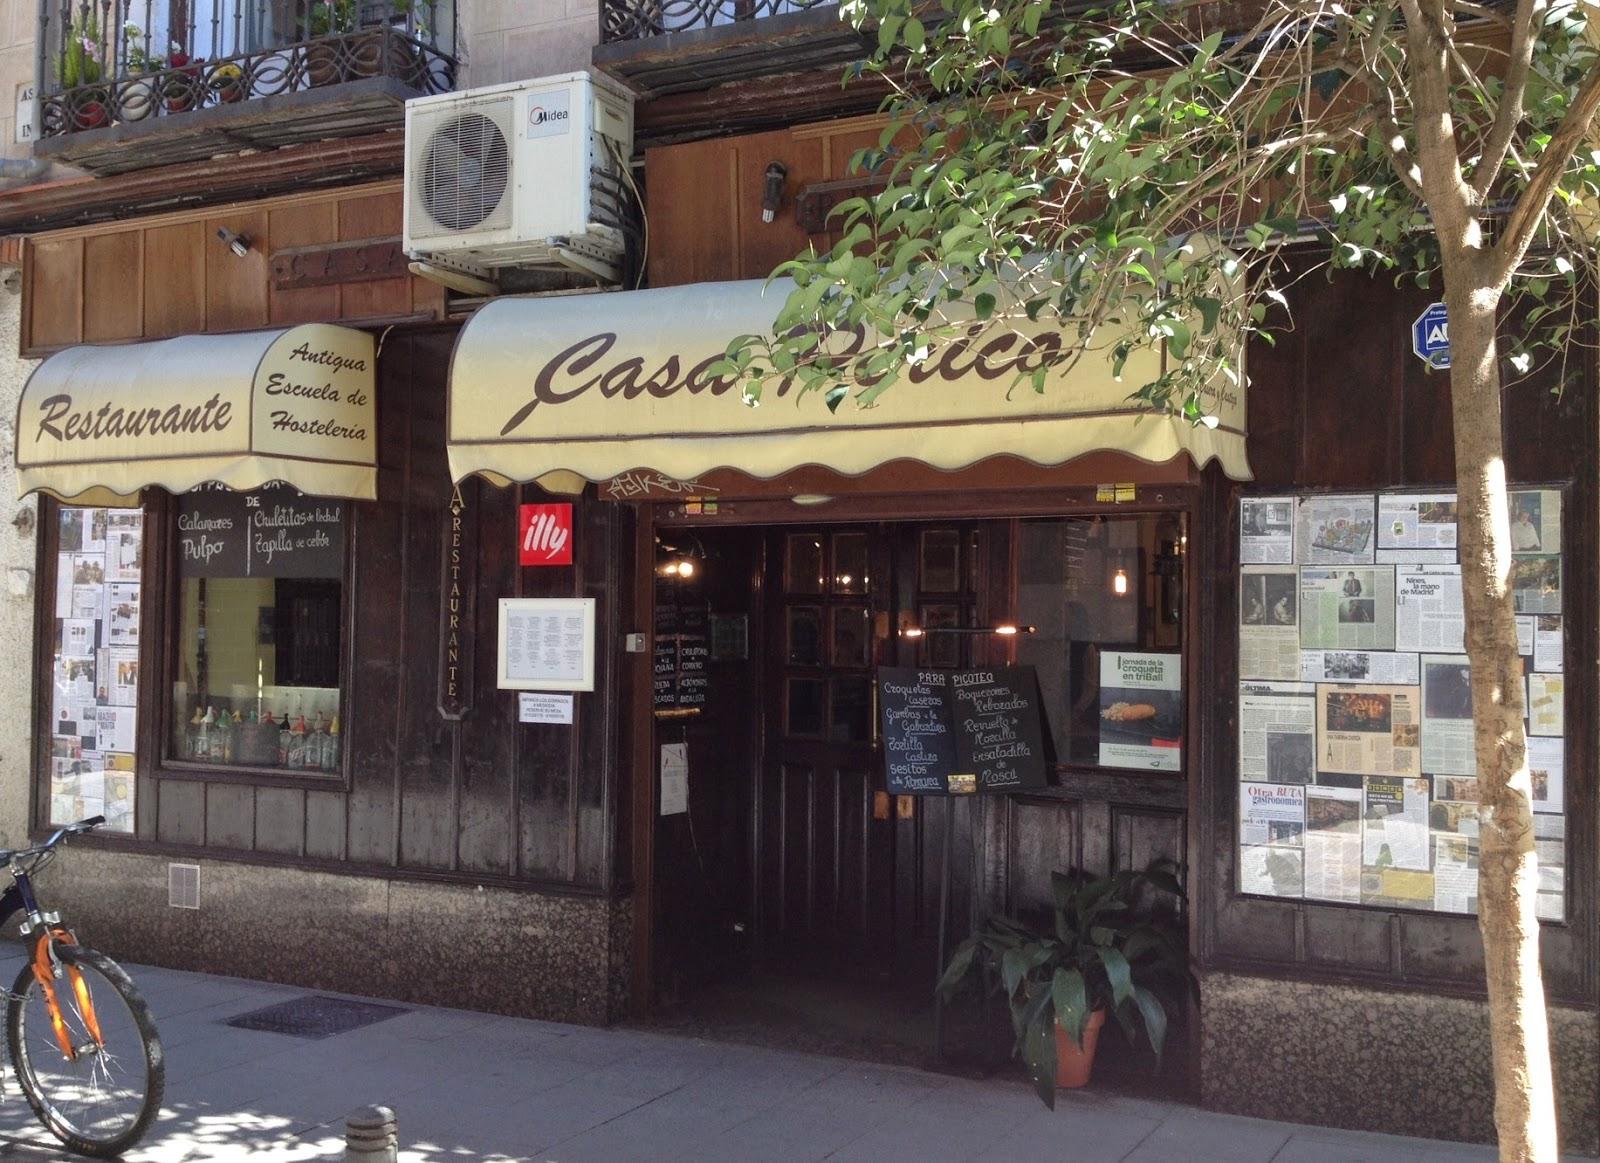 Aspicio1927 locales de madrid con historia casa perico - Casa perico madrid ...